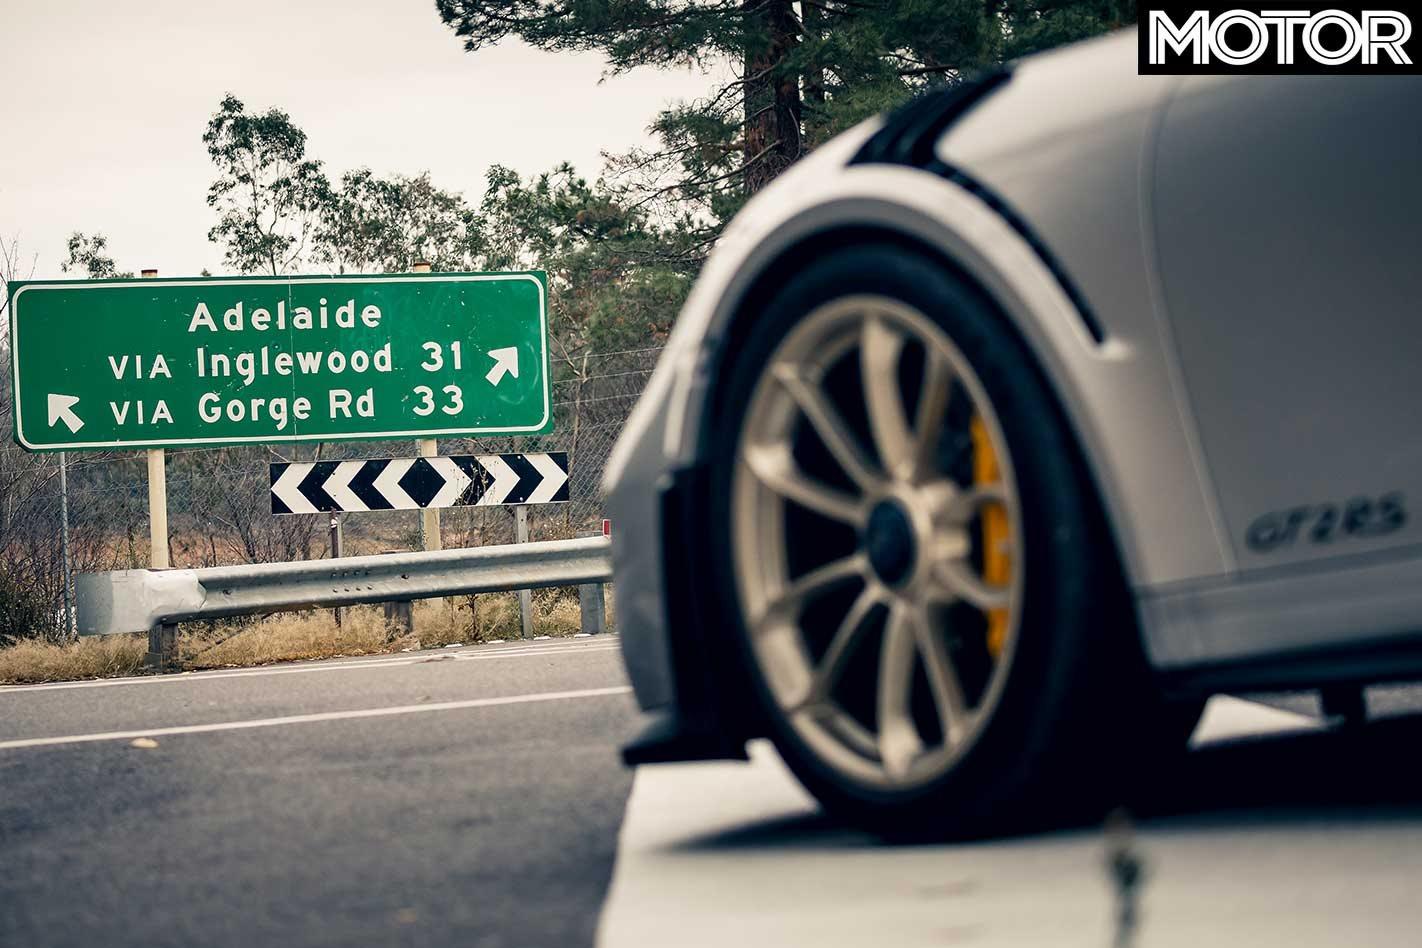 2018 Porsche 991 2 911 GT2 RS performance review